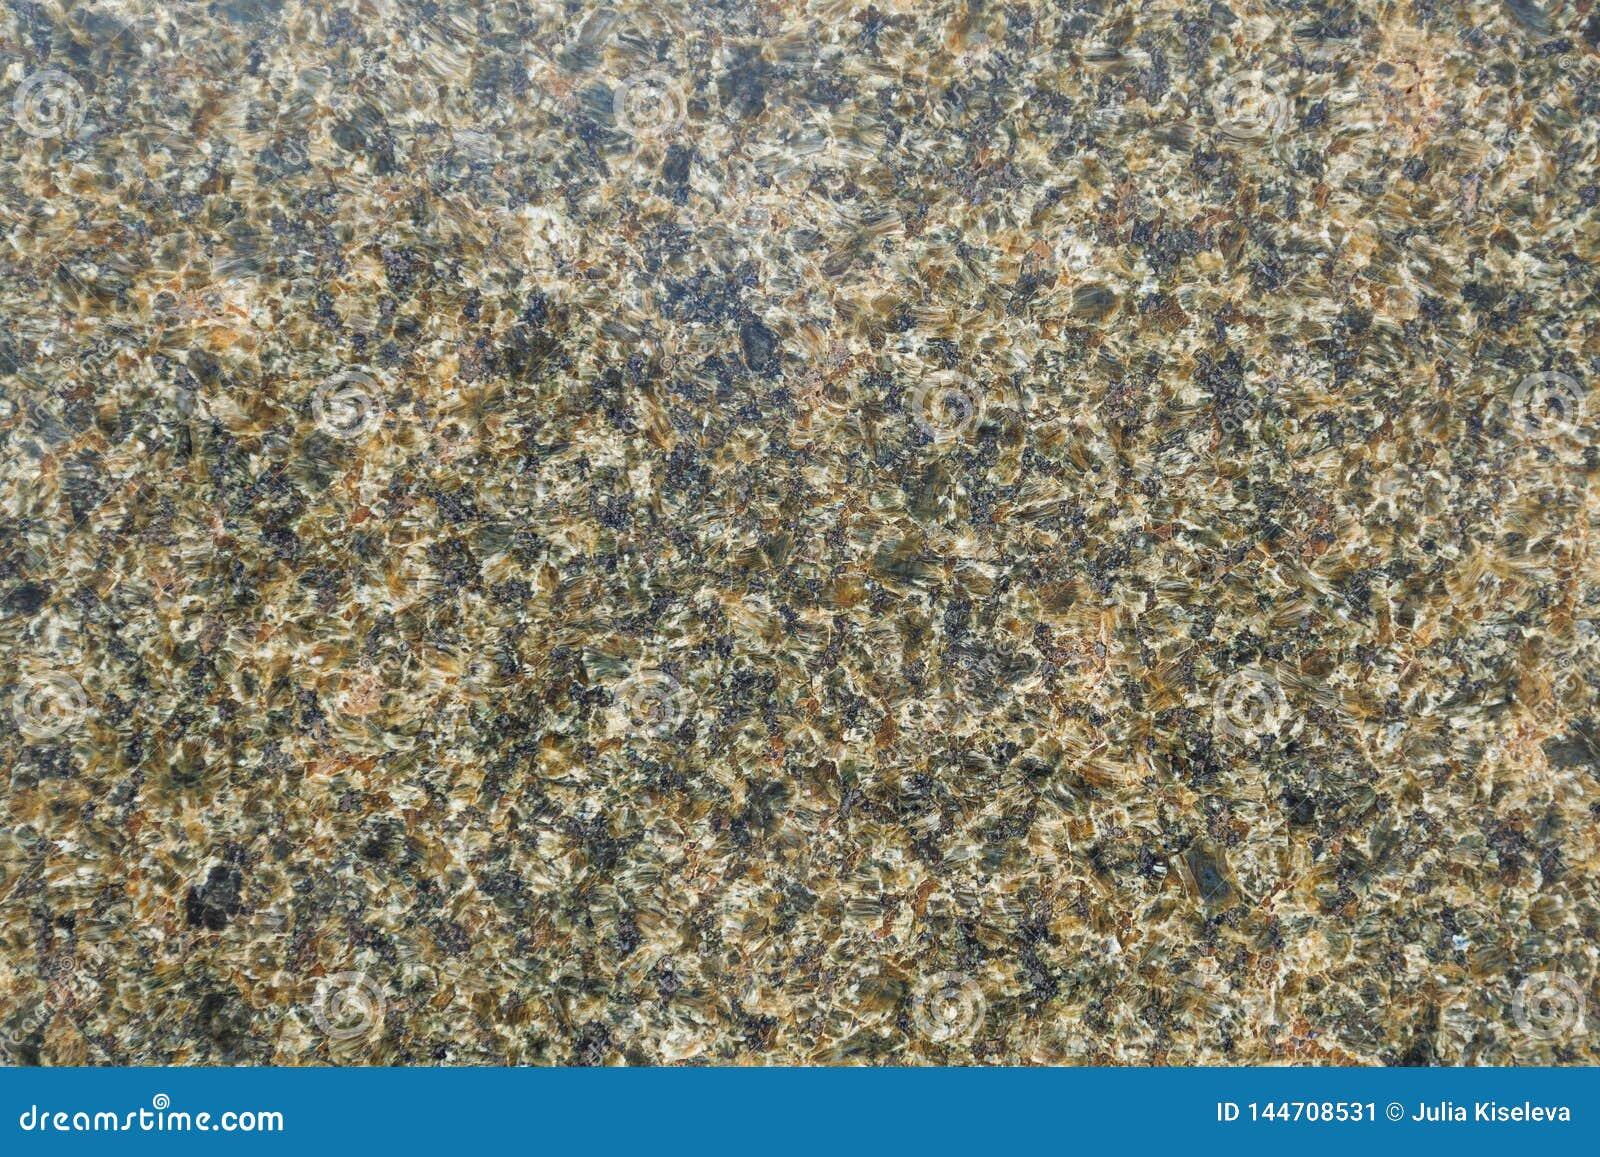 Textura de piedra natural